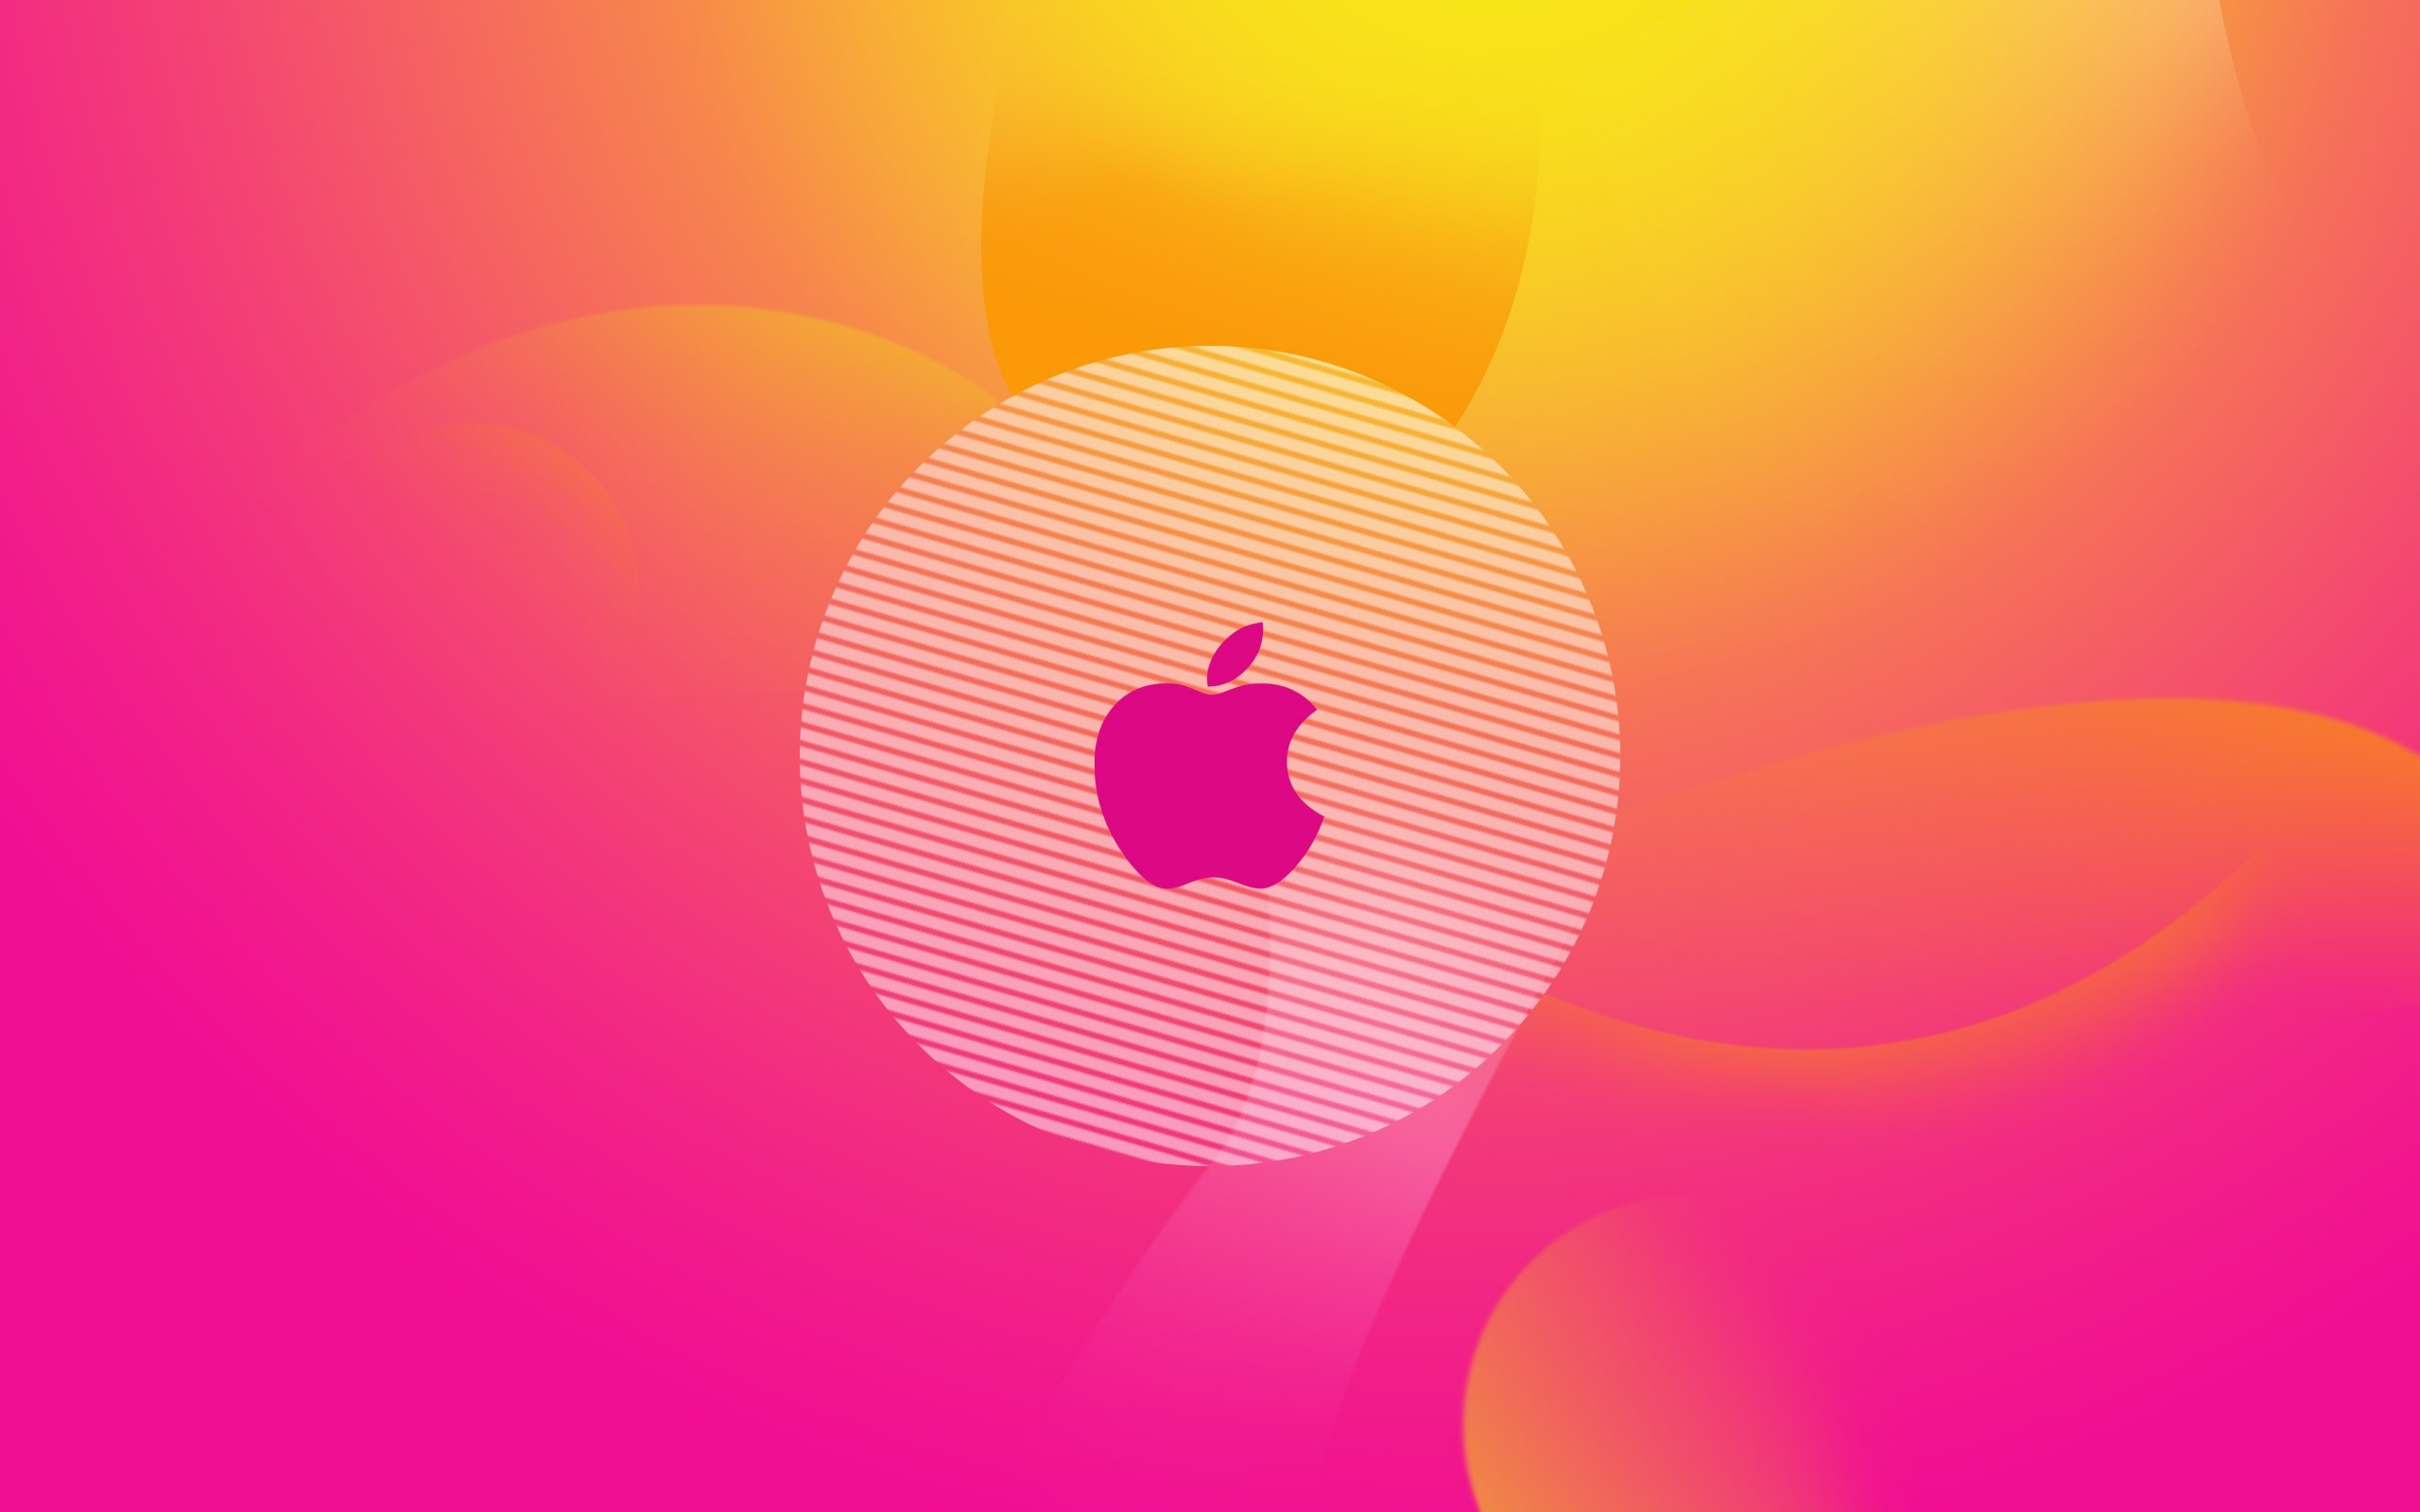 Apple Logo Pink Wallpaper 2560x1600